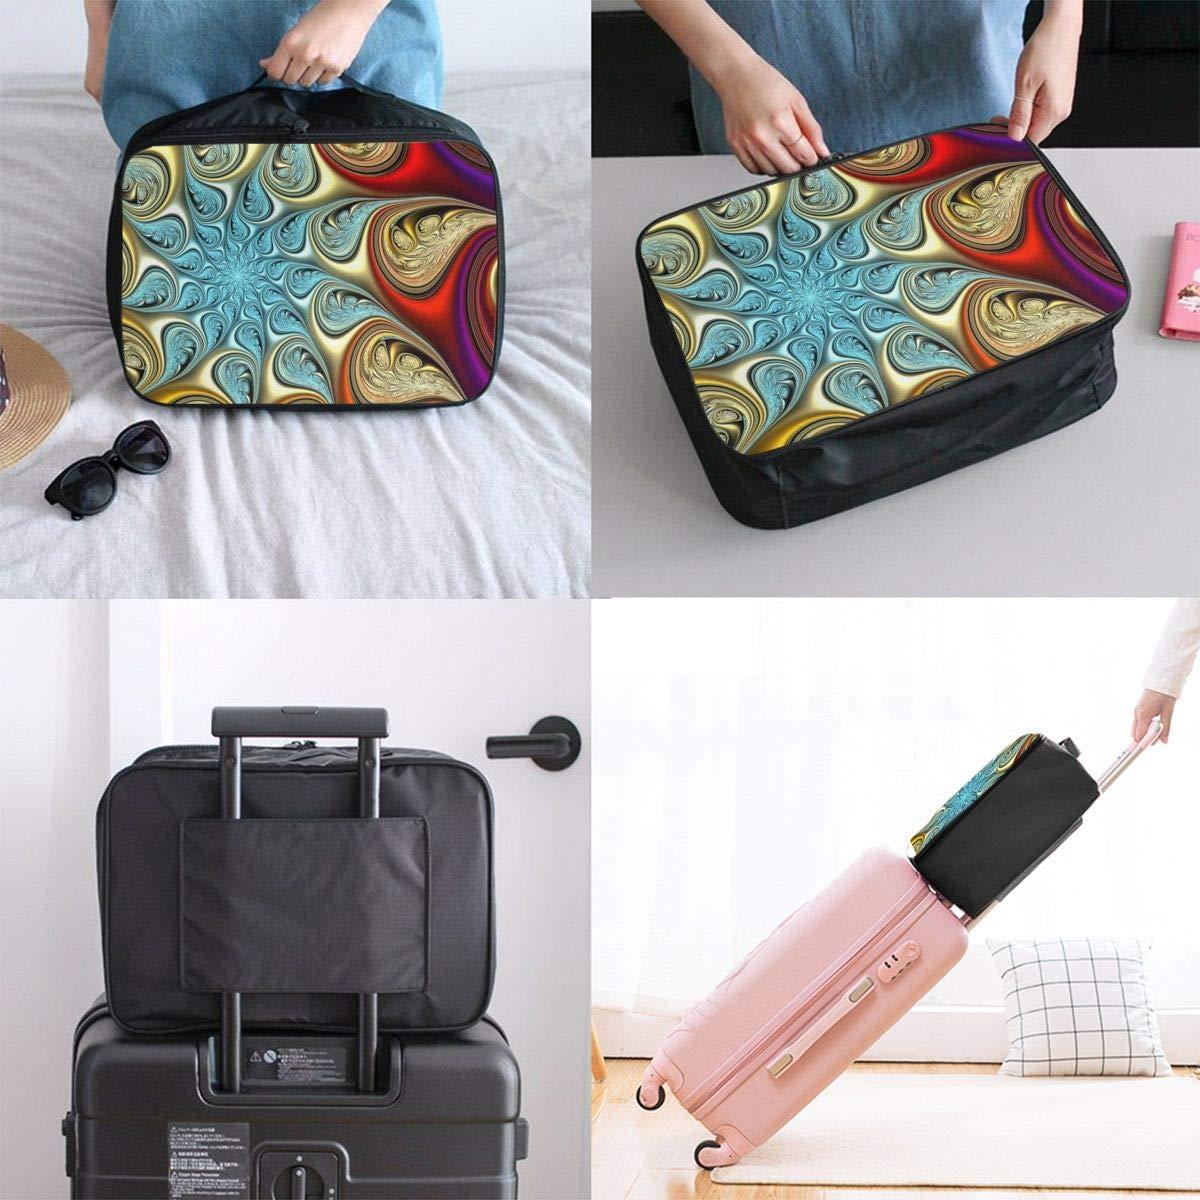 Shiba Inu And Sushi Travel Duffle Bag In Trolley Handle Lightweight Weekender Bag Nylon Luggage Duffel Bag Sports Luggage Bag Gym Holiday Overnight Carry On Bag